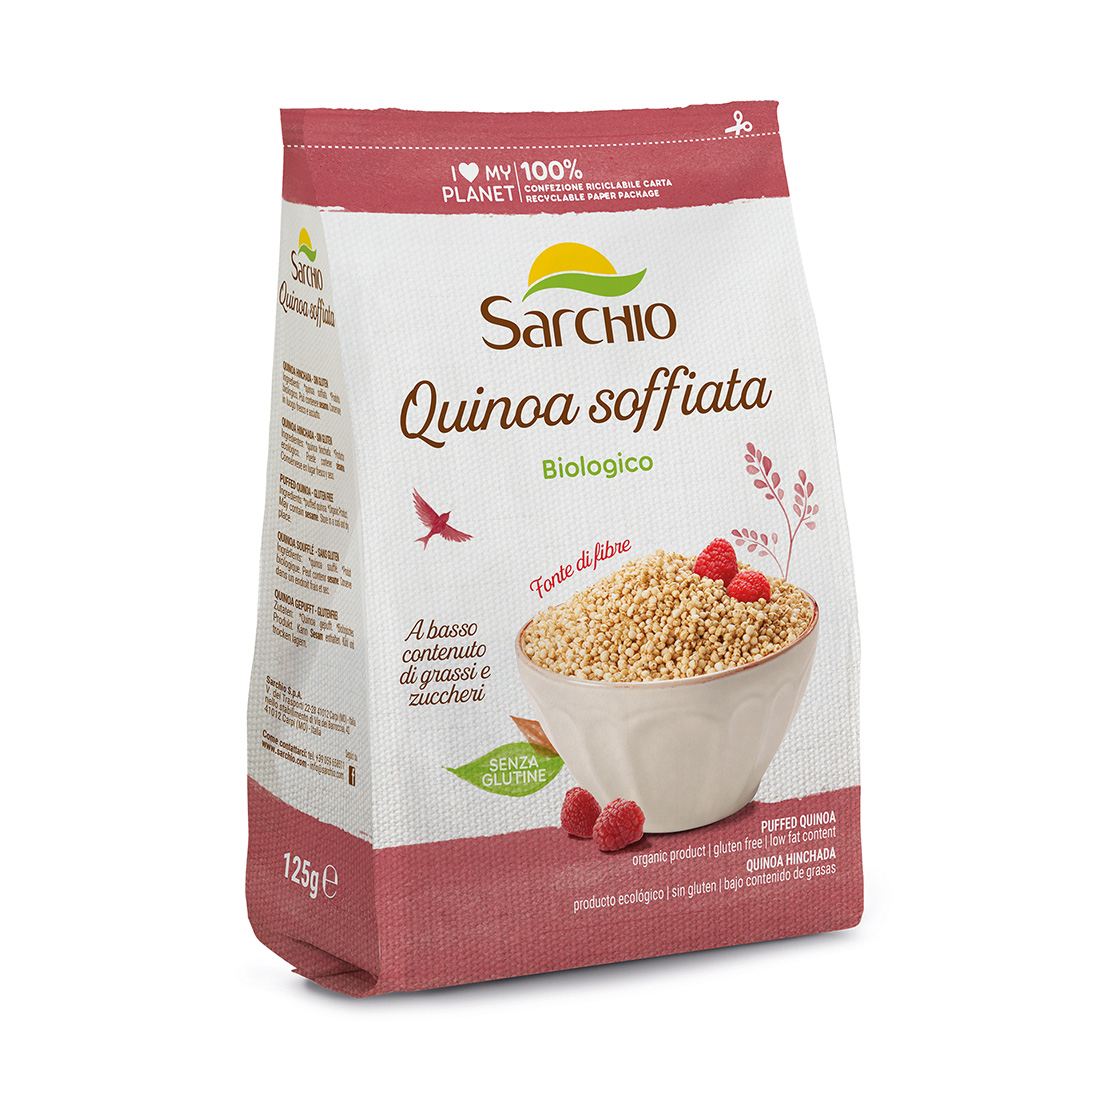 Puffed Quinoa